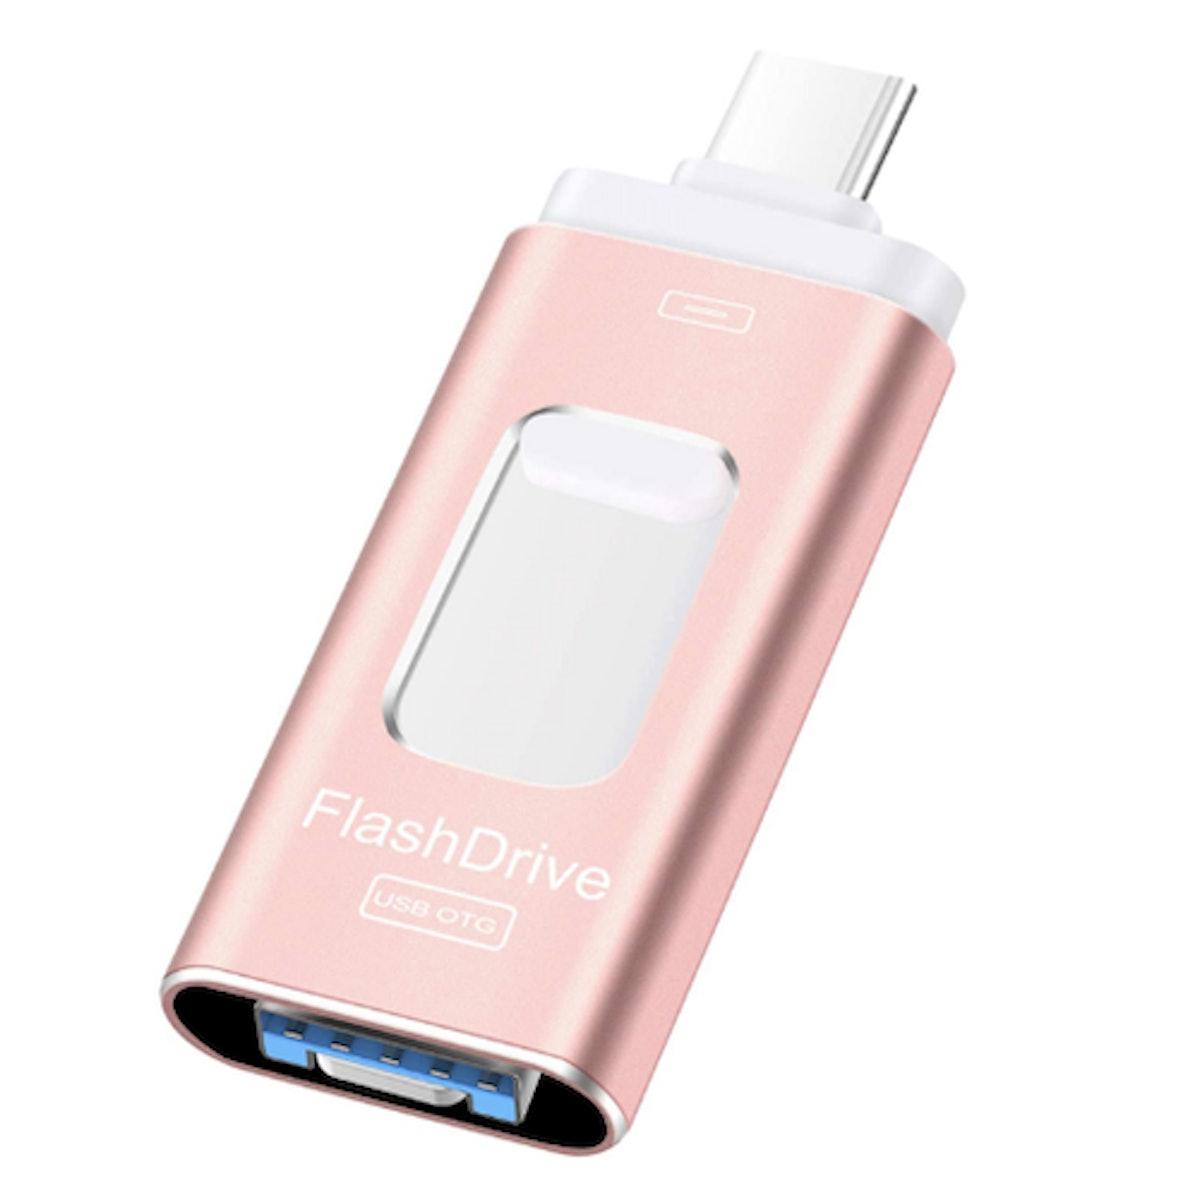 Sunany 3-In-1 USB Flash Drive, 128 GB